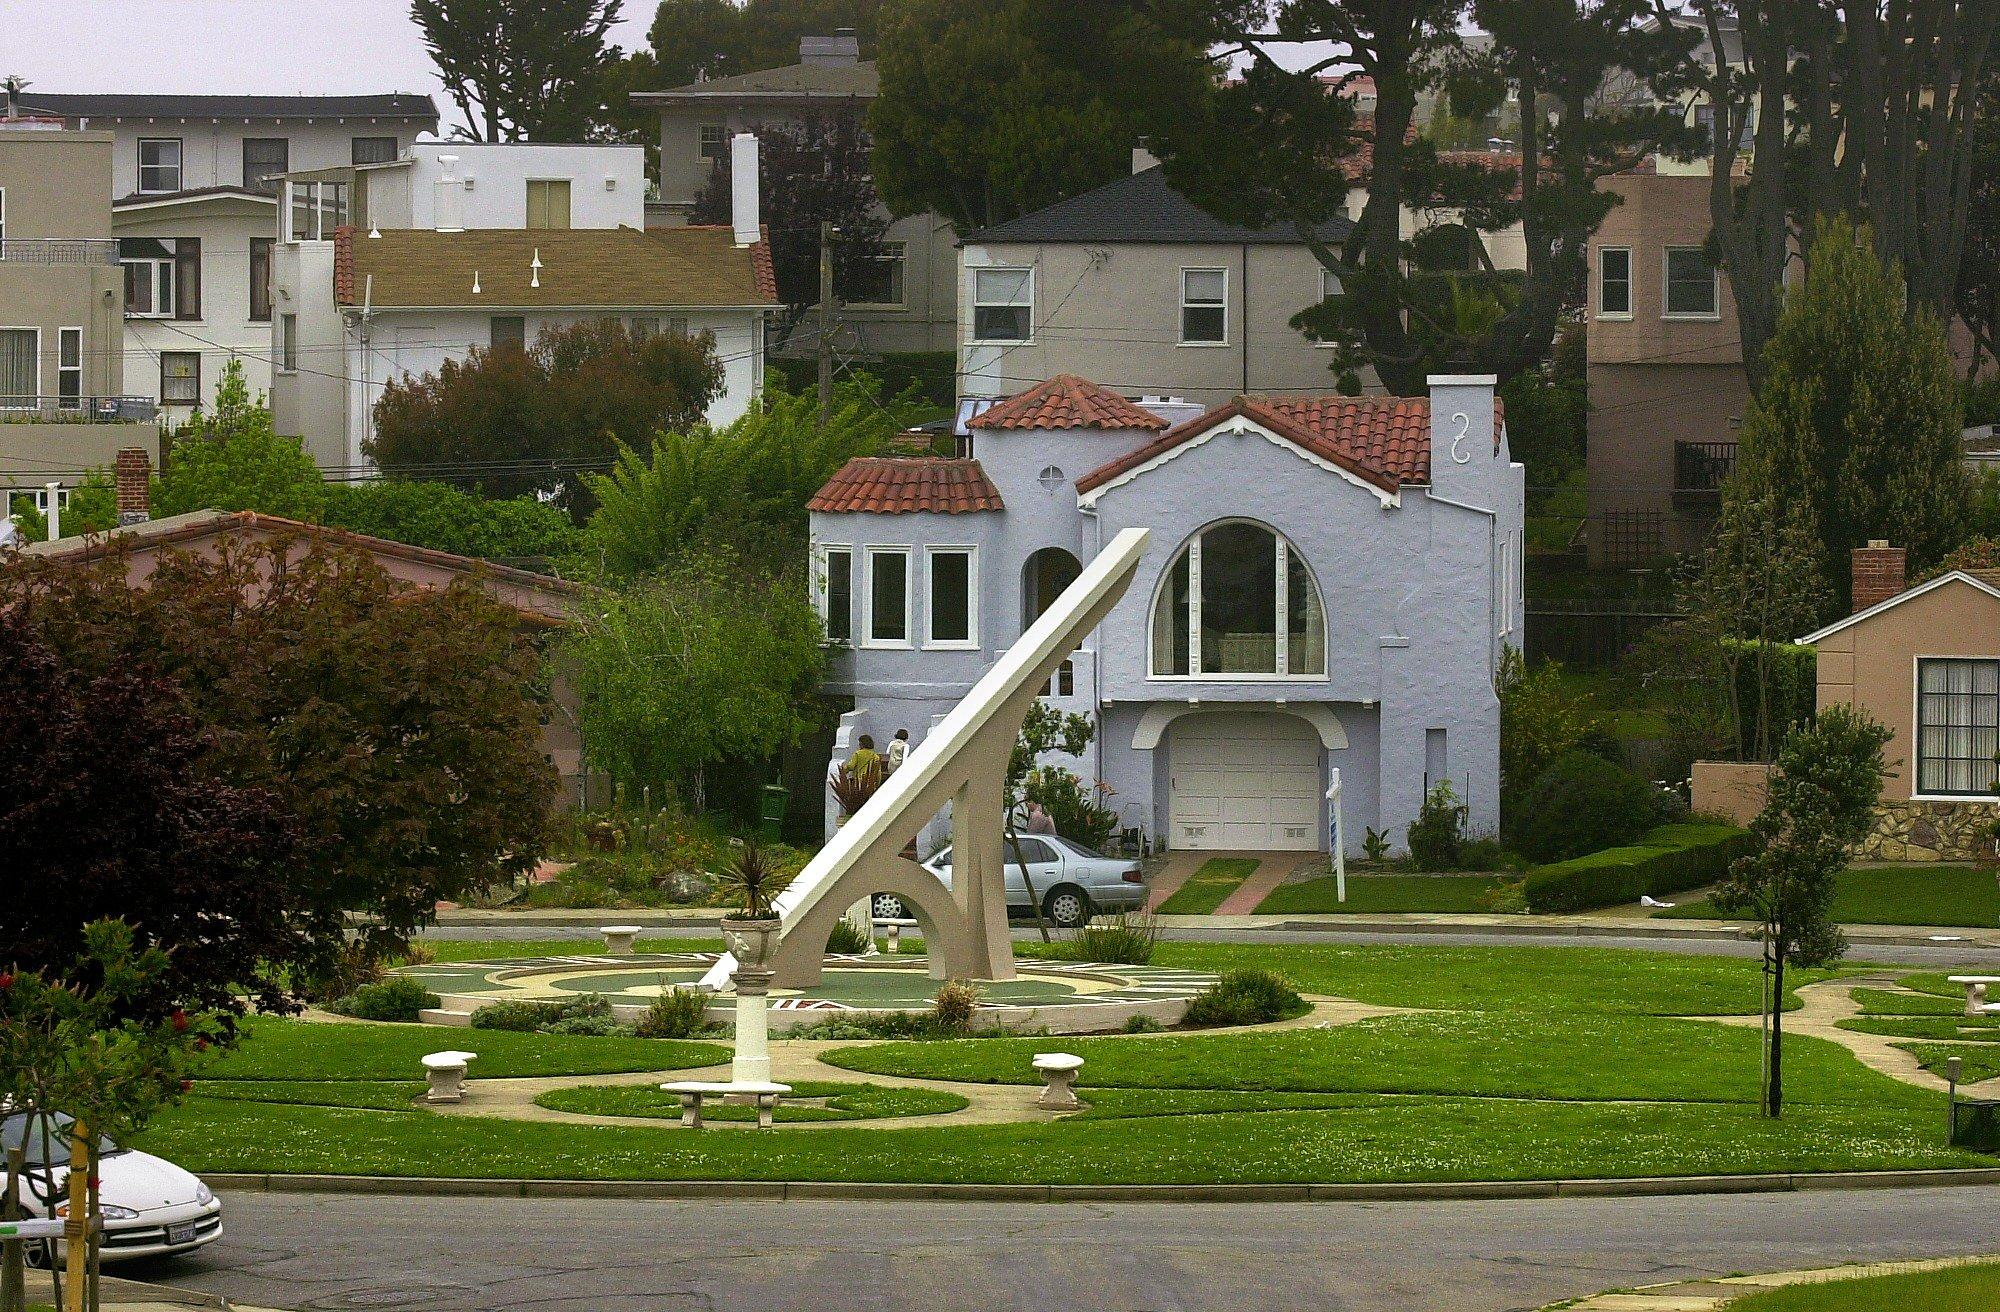 Readers' picks: More of San Francisco's hidden gems